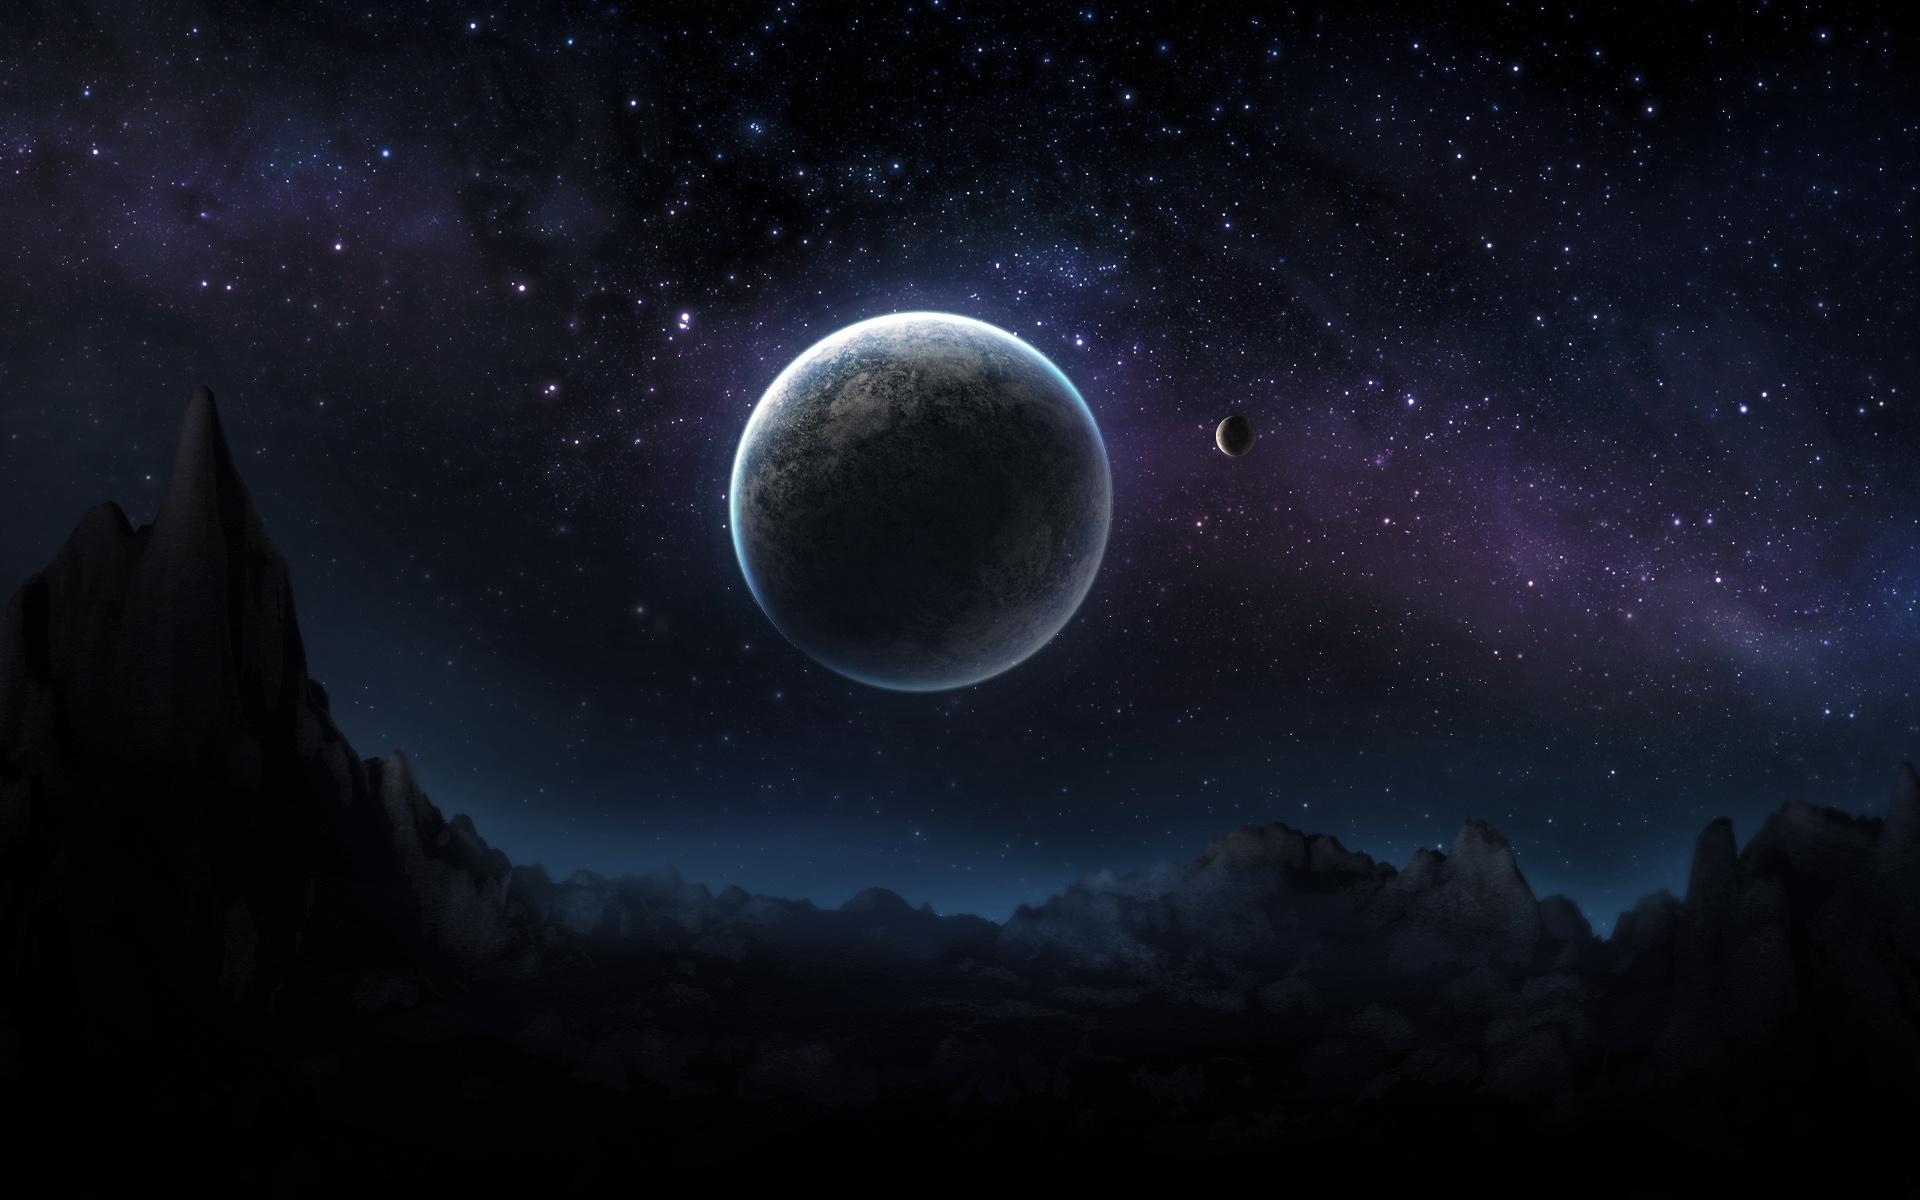 Scene Photo At Dark Night For Desktop Background Wallpapers